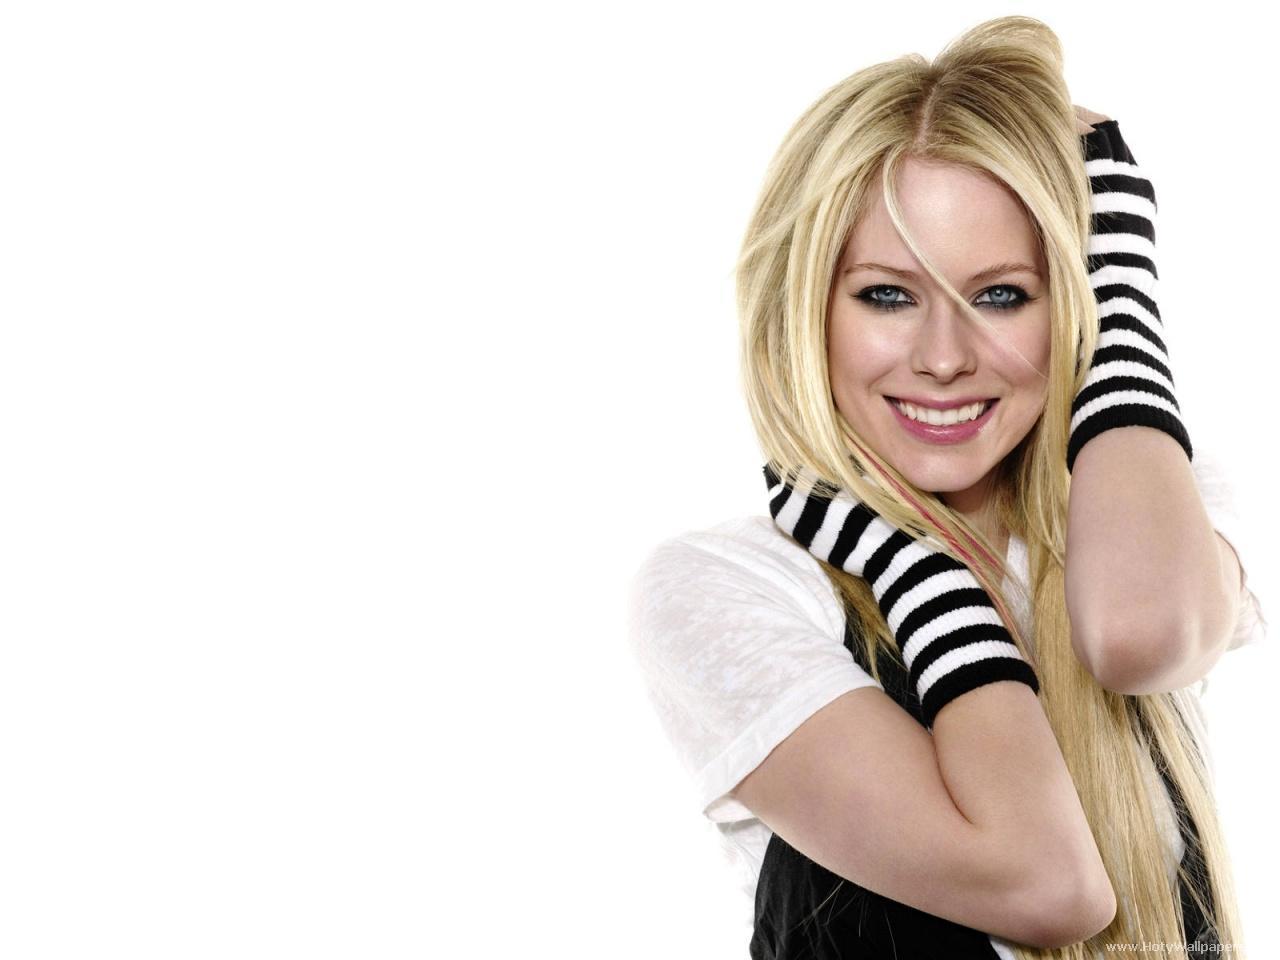 http://1.bp.blogspot.com/-5g-yGE0yMCg/Tjq_NoFGCNI/AAAAAAAAIpQ/g5xoIKRoiag/s1600/singer_Avril_Lavigne_wallpaper.jpg